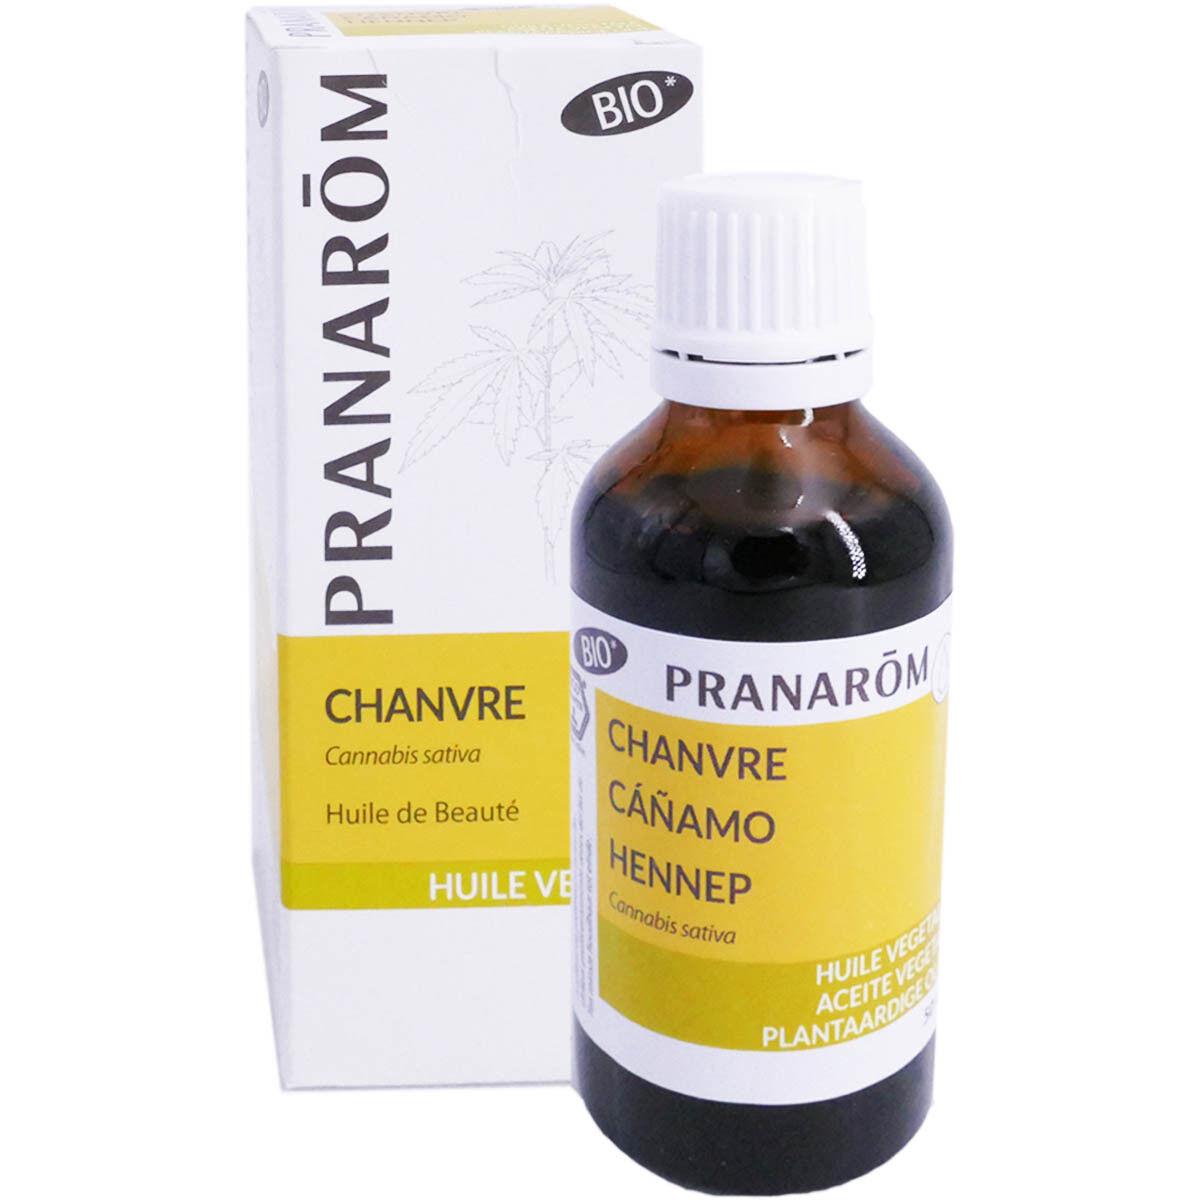 Pranarom huile vegetale bio chanvre 50ml